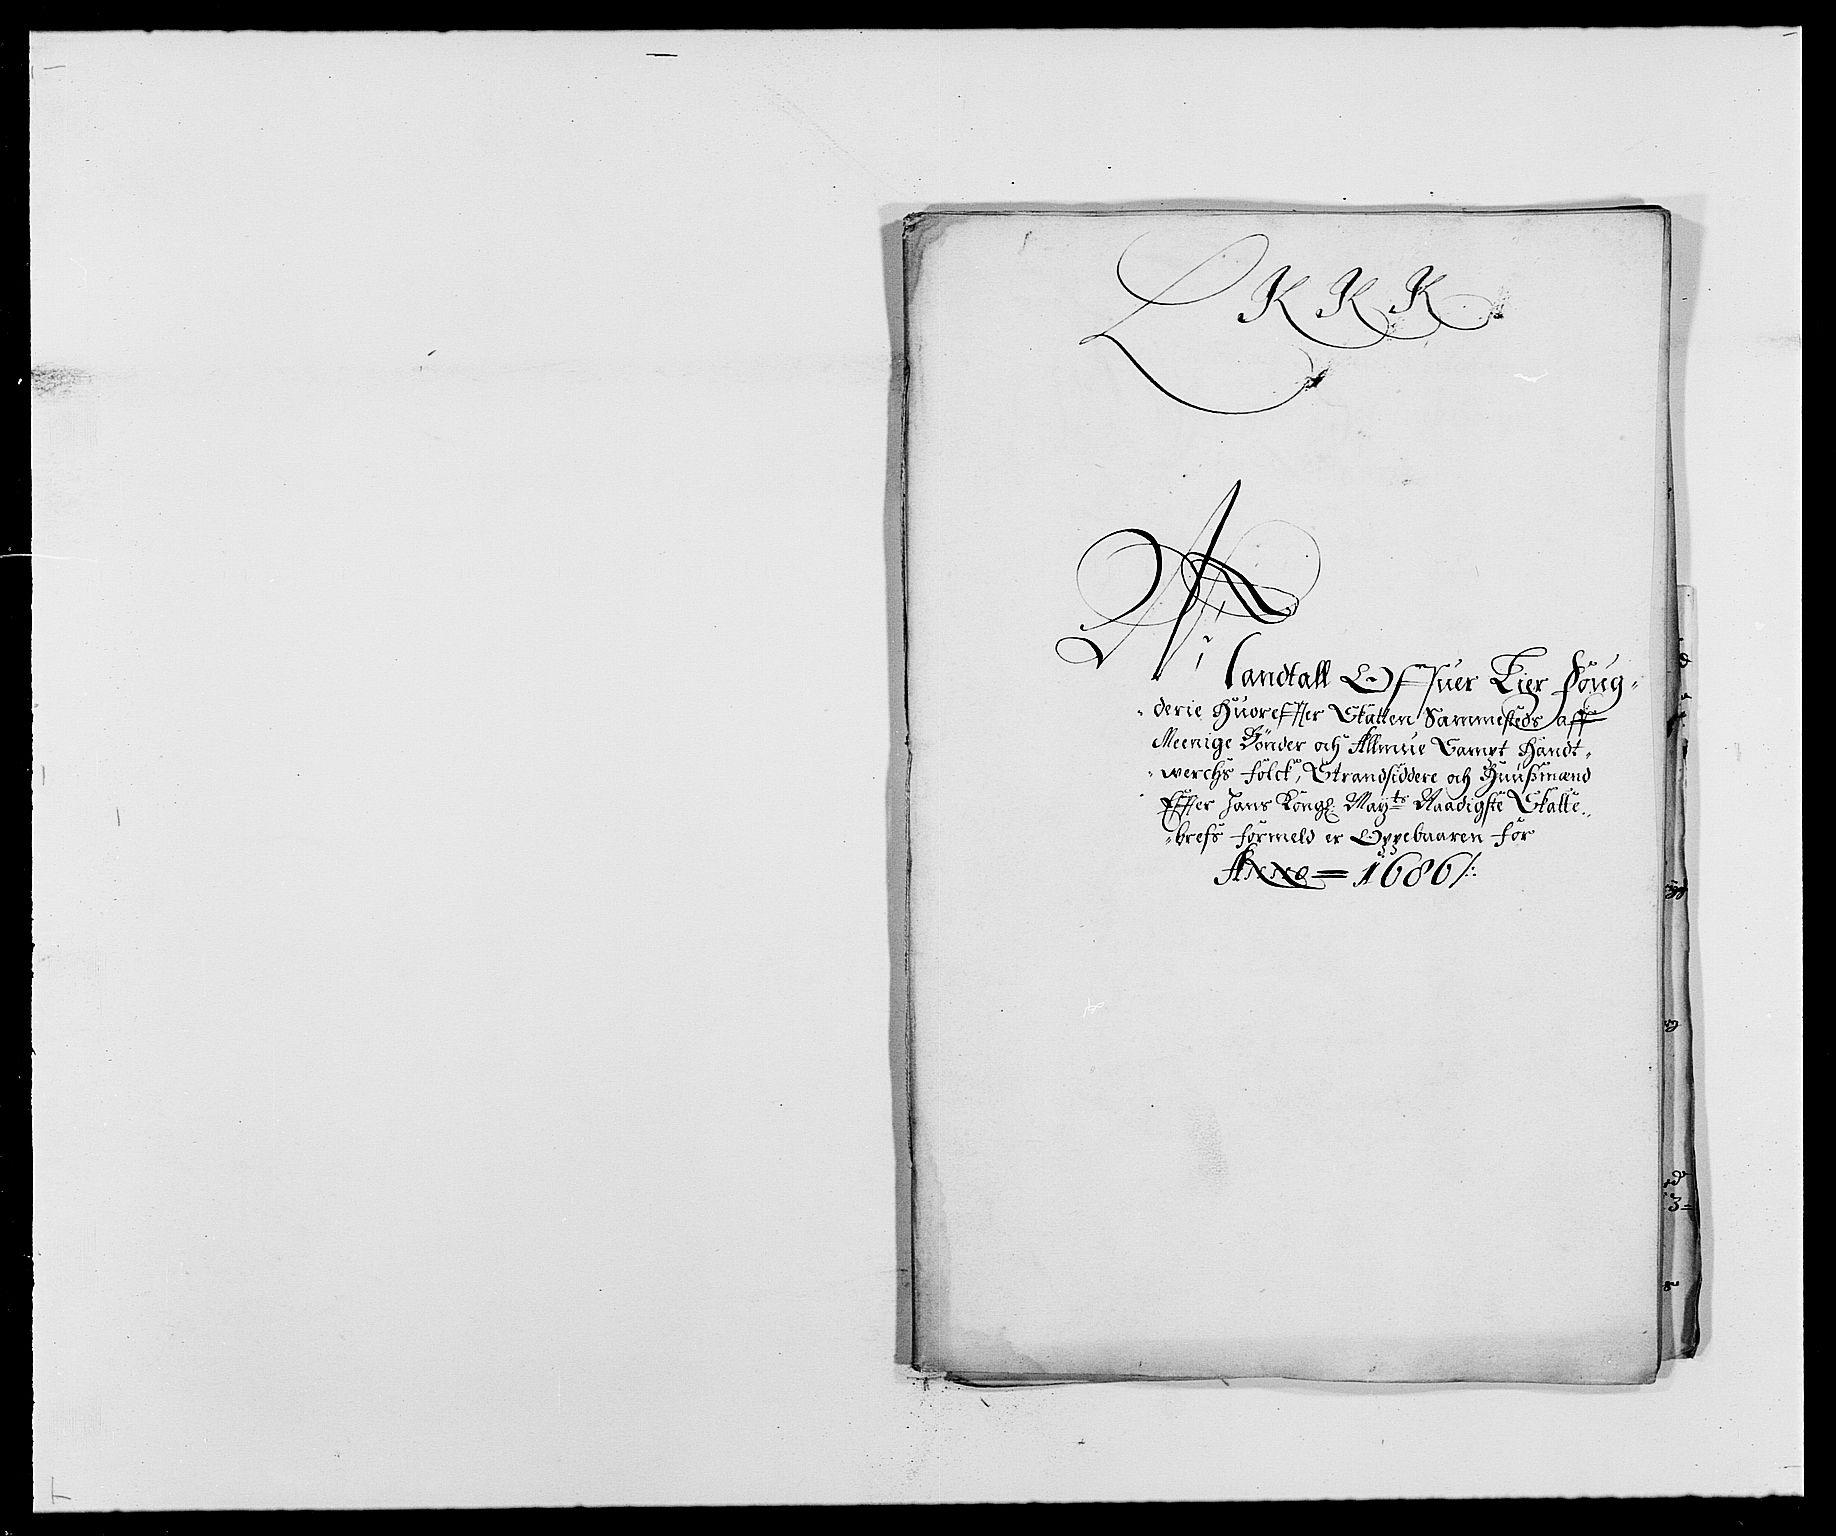 RA, Rentekammeret inntil 1814, Reviderte regnskaper, Fogderegnskap, R27/L1687: Fogderegnskap Lier, 1678-1686, s. 236